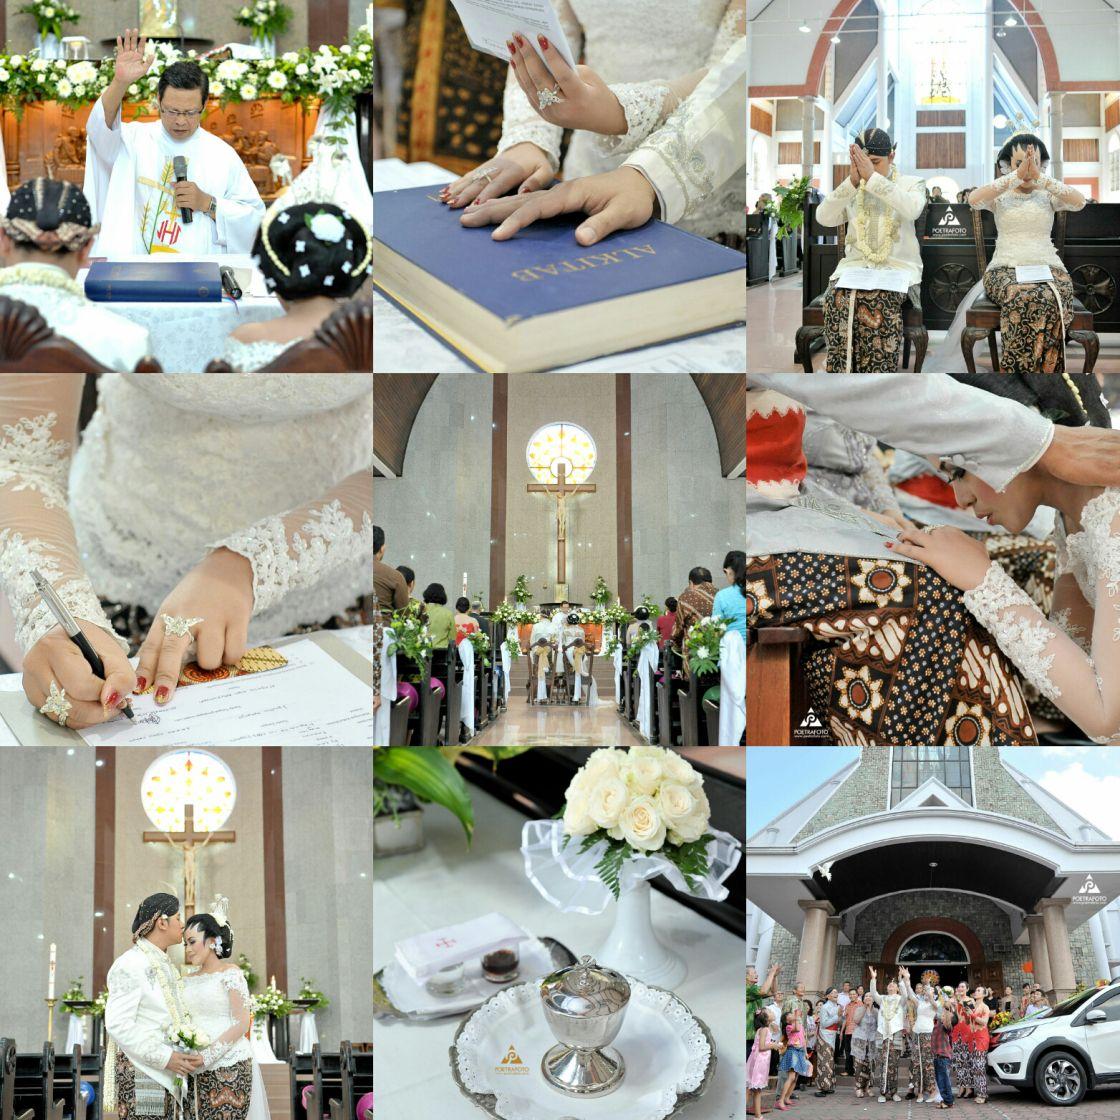 8 Foto Pemberkatan Nikah Nila+Gigih di Gereja Katolik Jogja